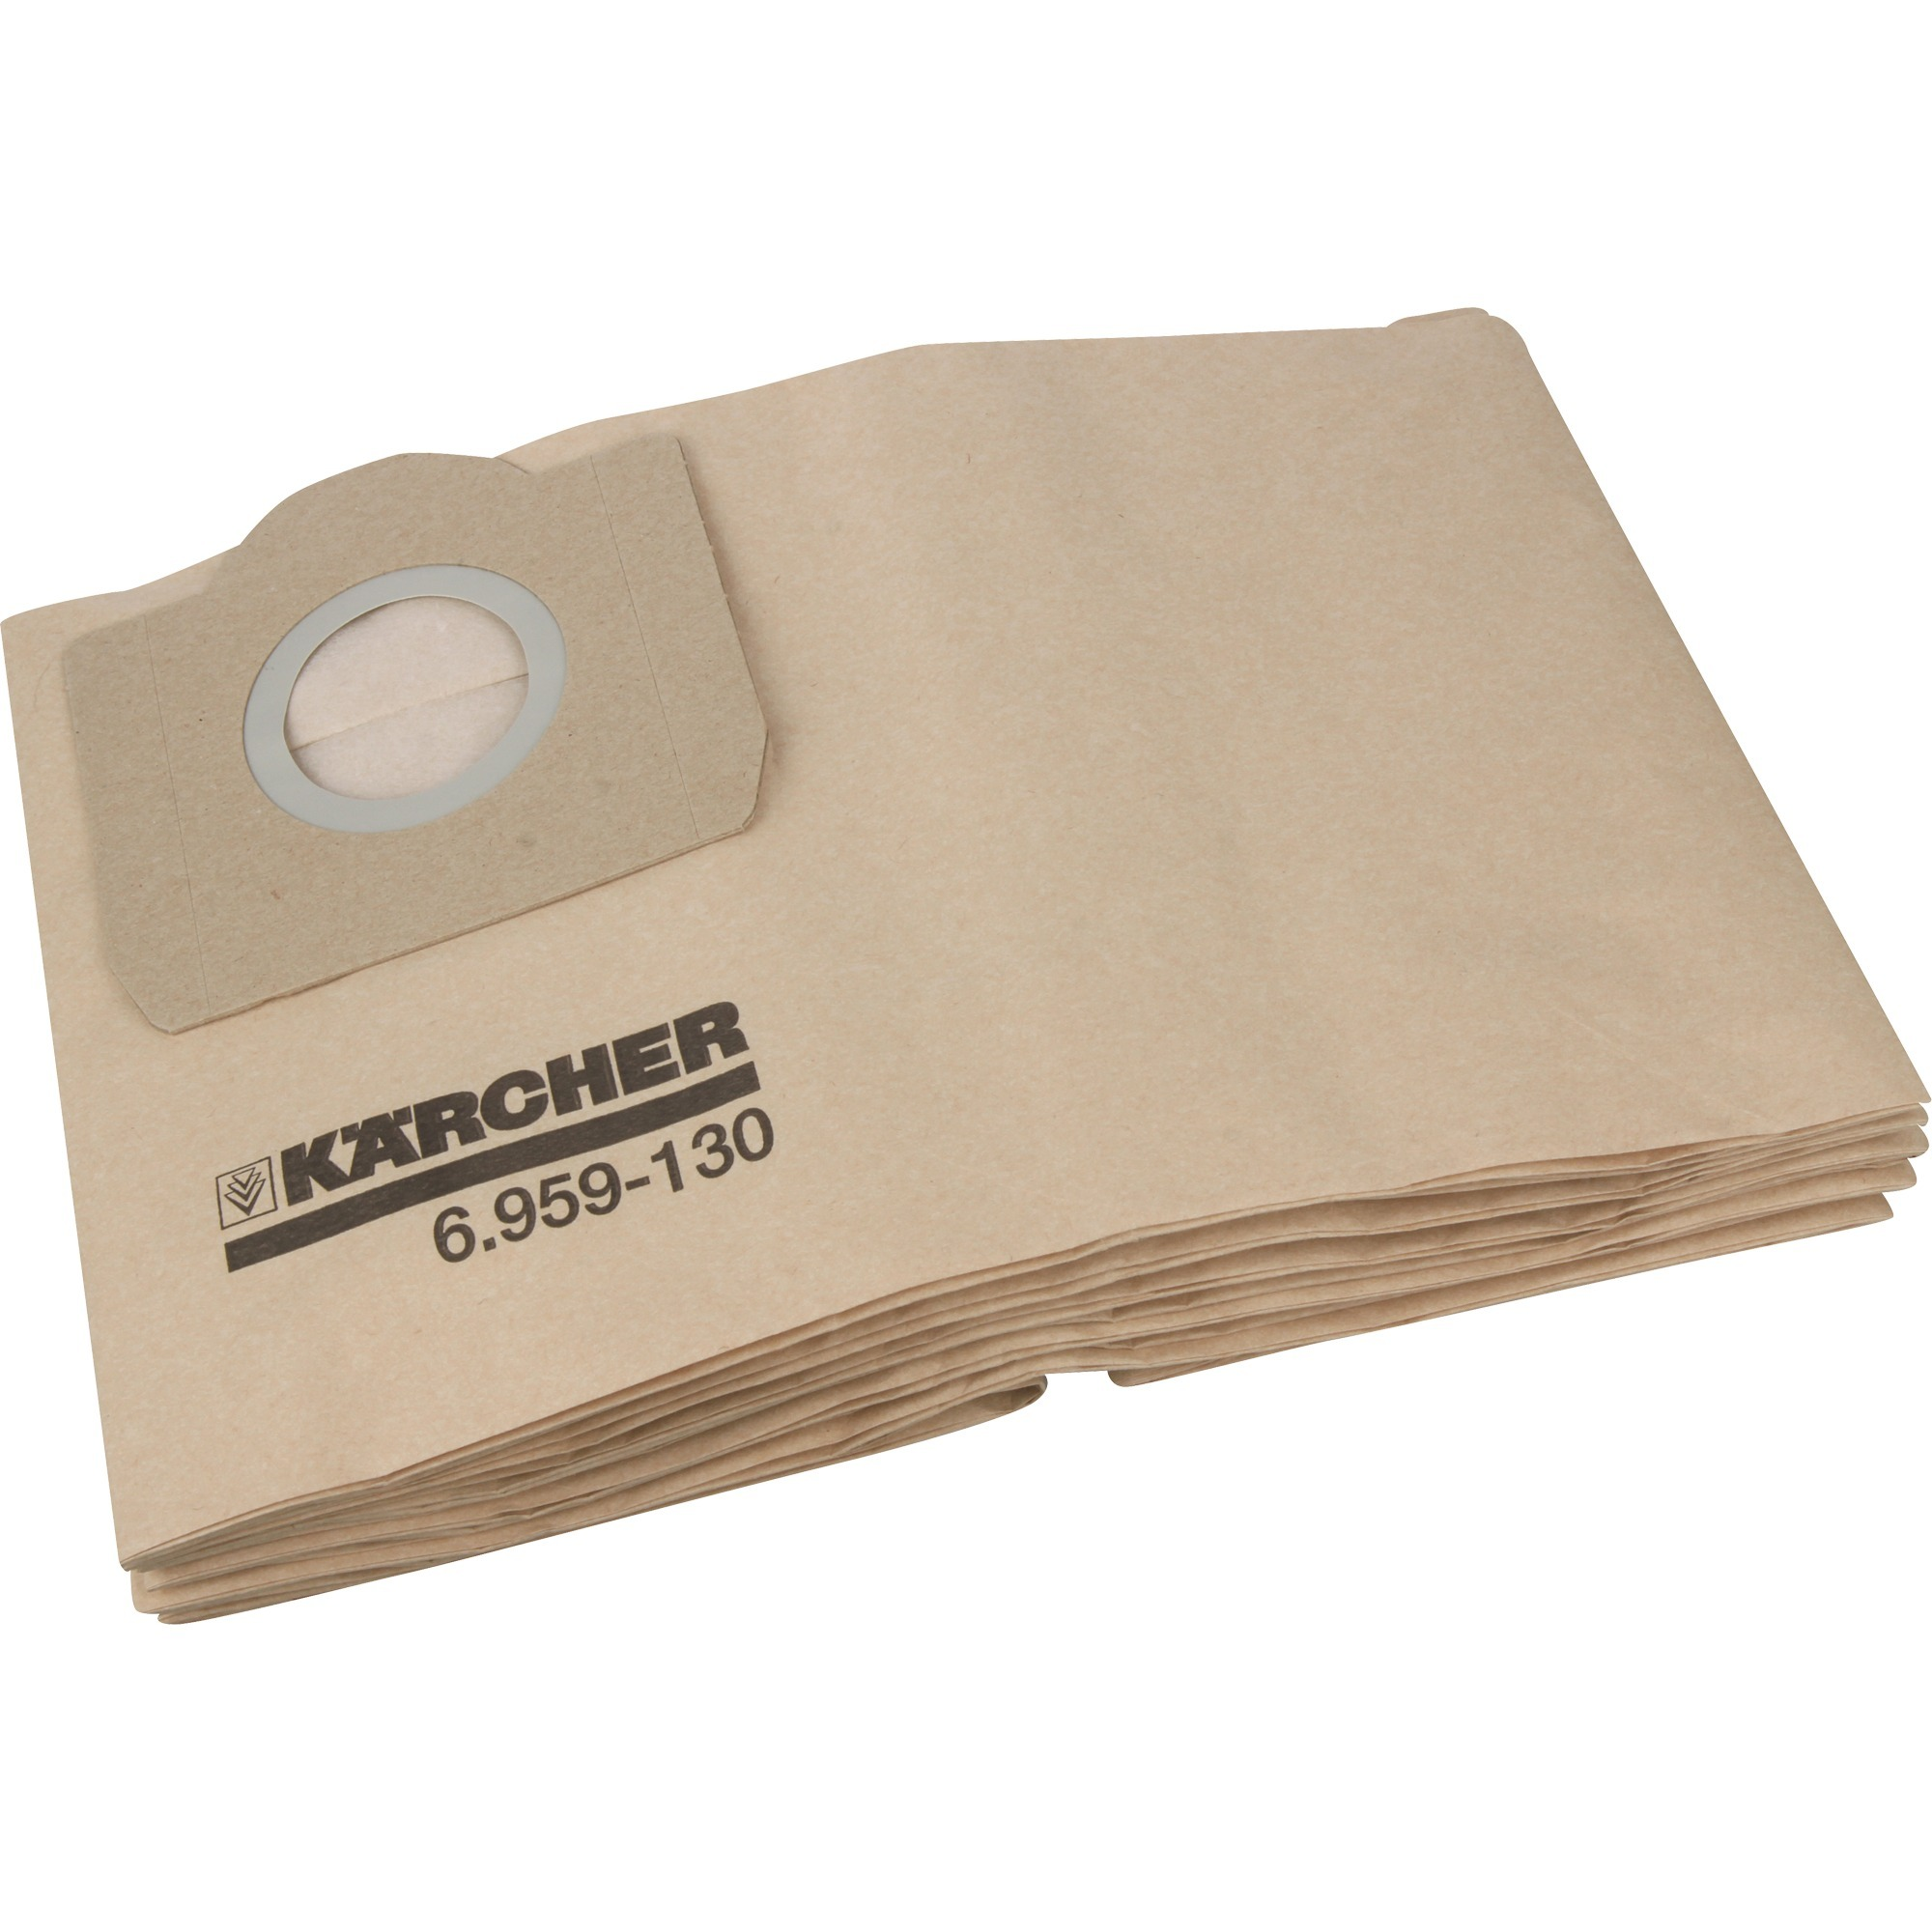 10 Pezzo 6.959-130.0 Aspirapolvere Sacchetto per Karcher